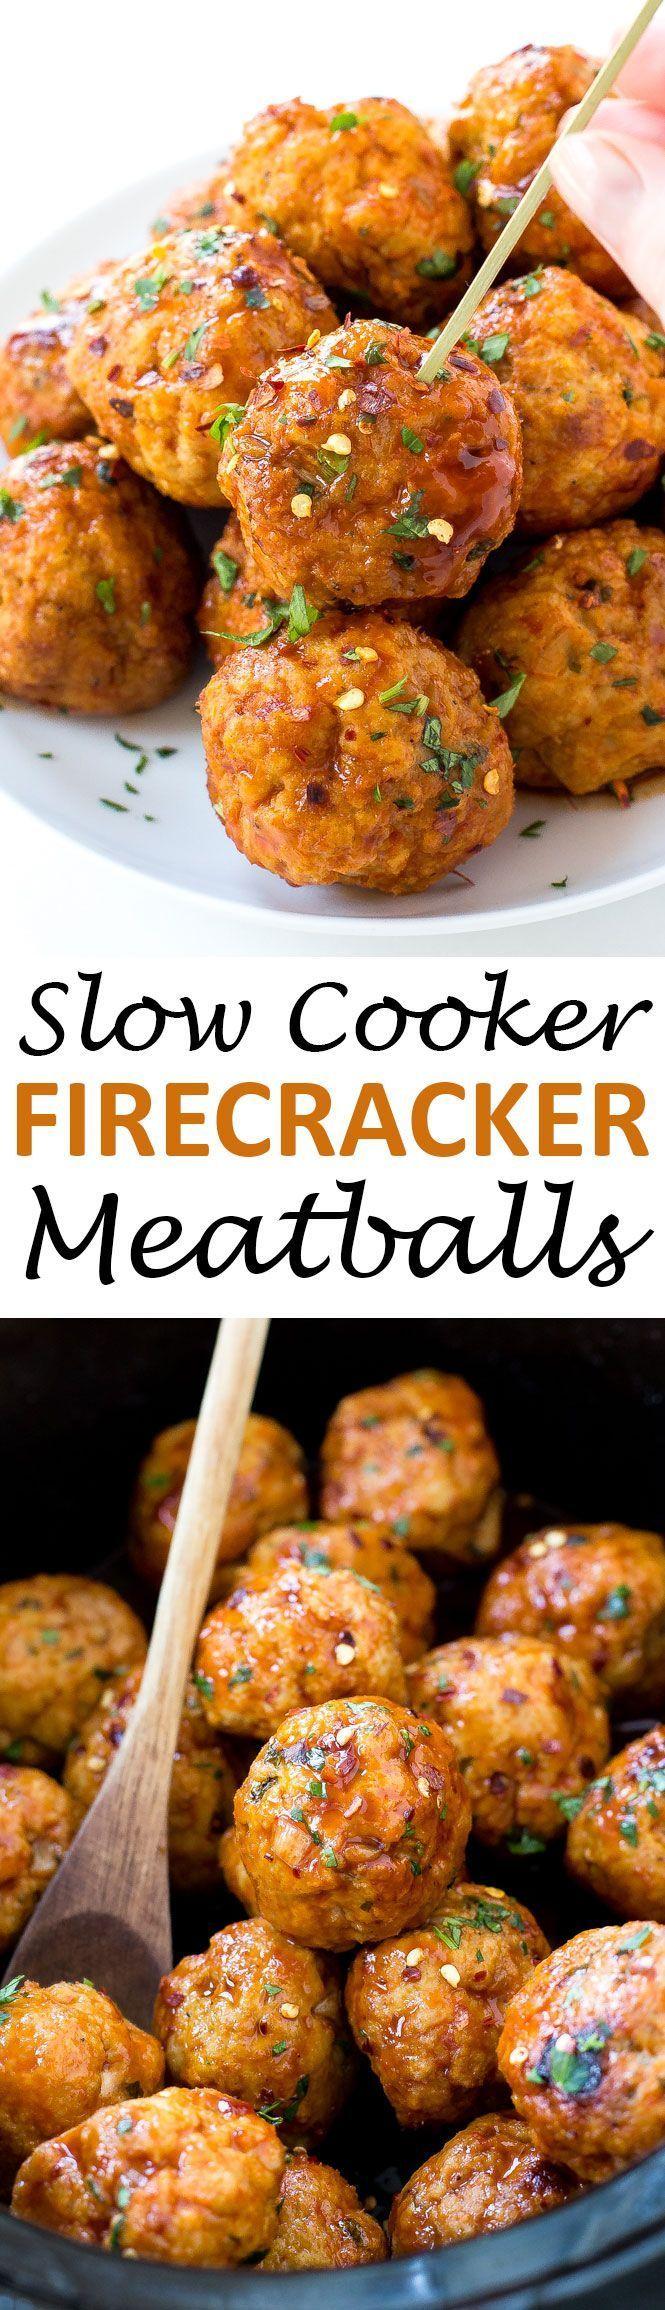 17 Best ideas about Firecracker Chicken on Pinterest ...